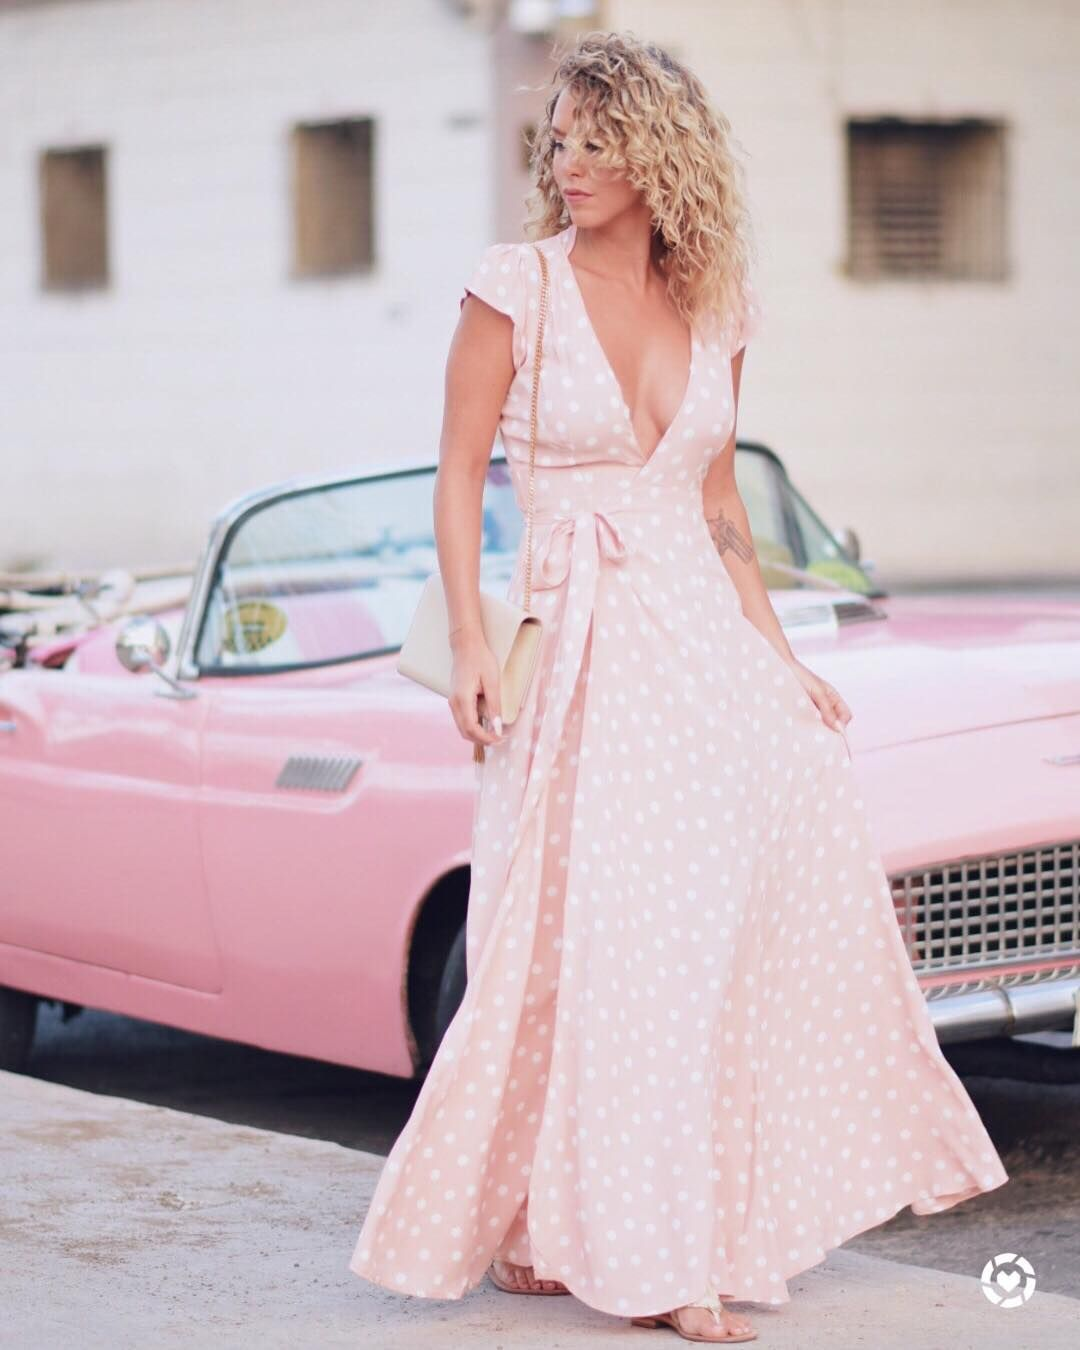 pink polkadot dress and pink convertible car in havana cuba | Kier ...